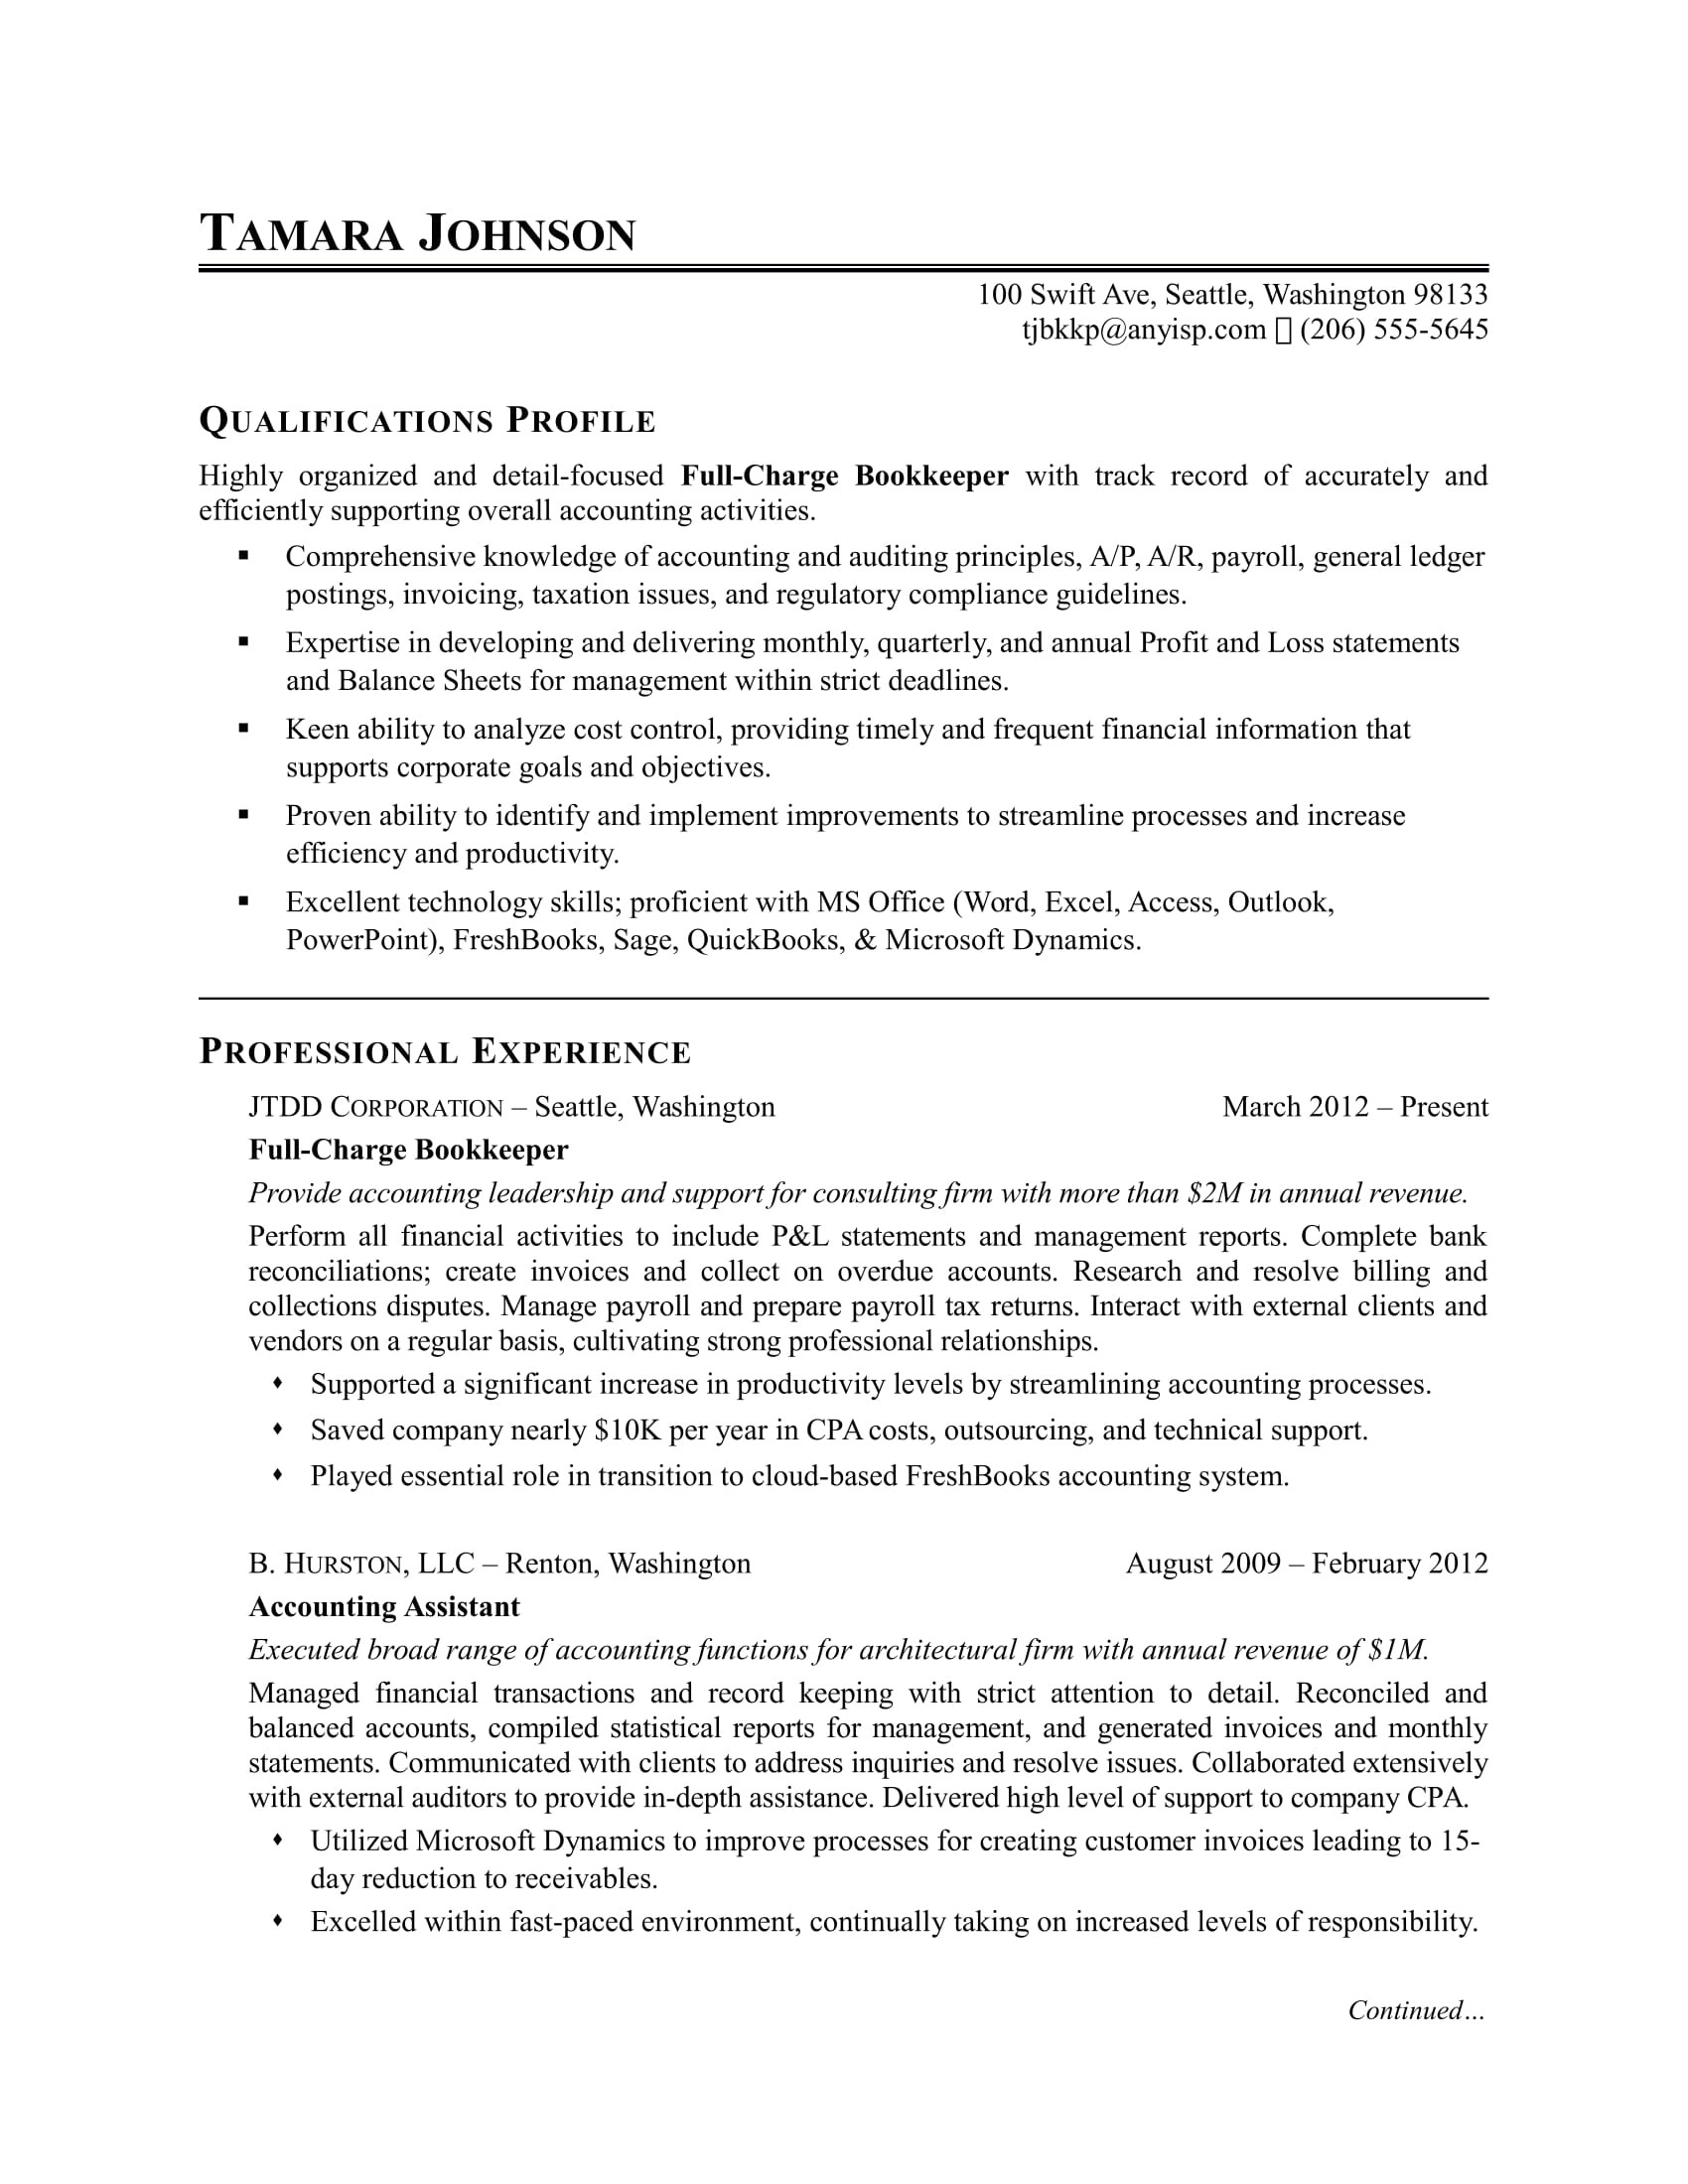 sample resume bookkeeper